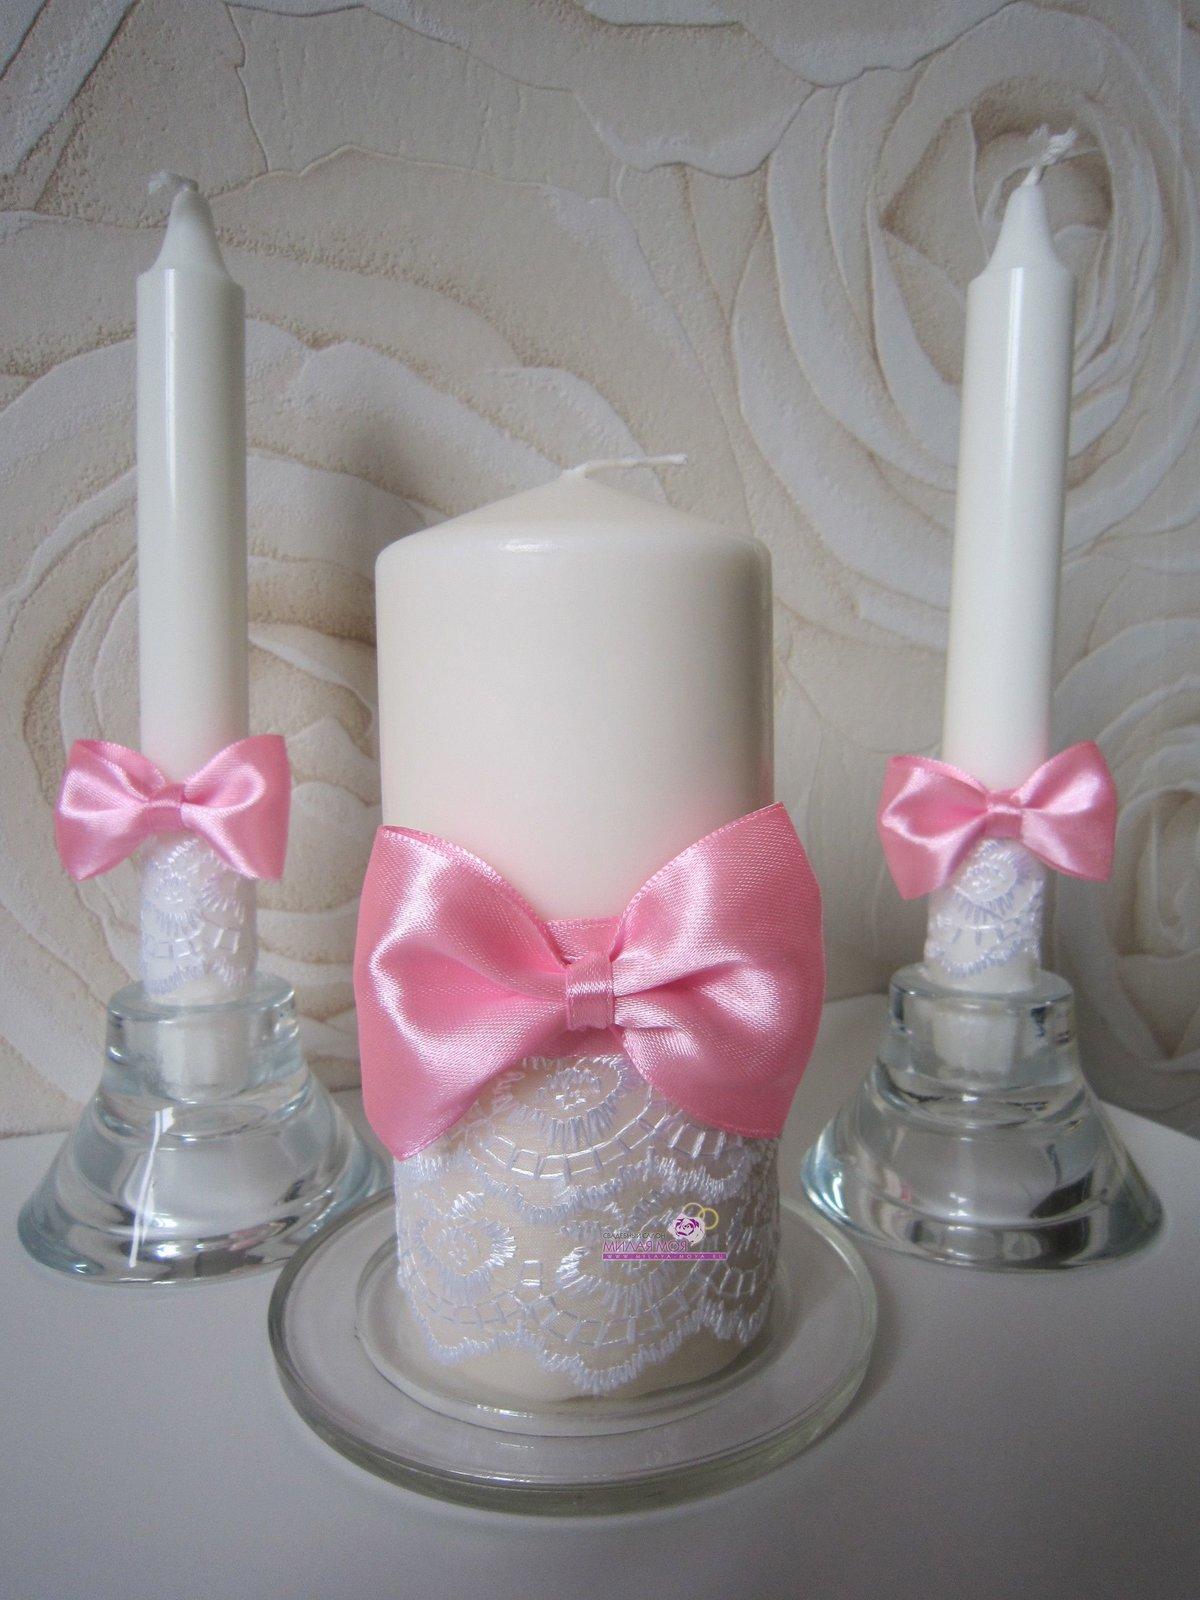 картинки свадебные свечи своими руками сети давно